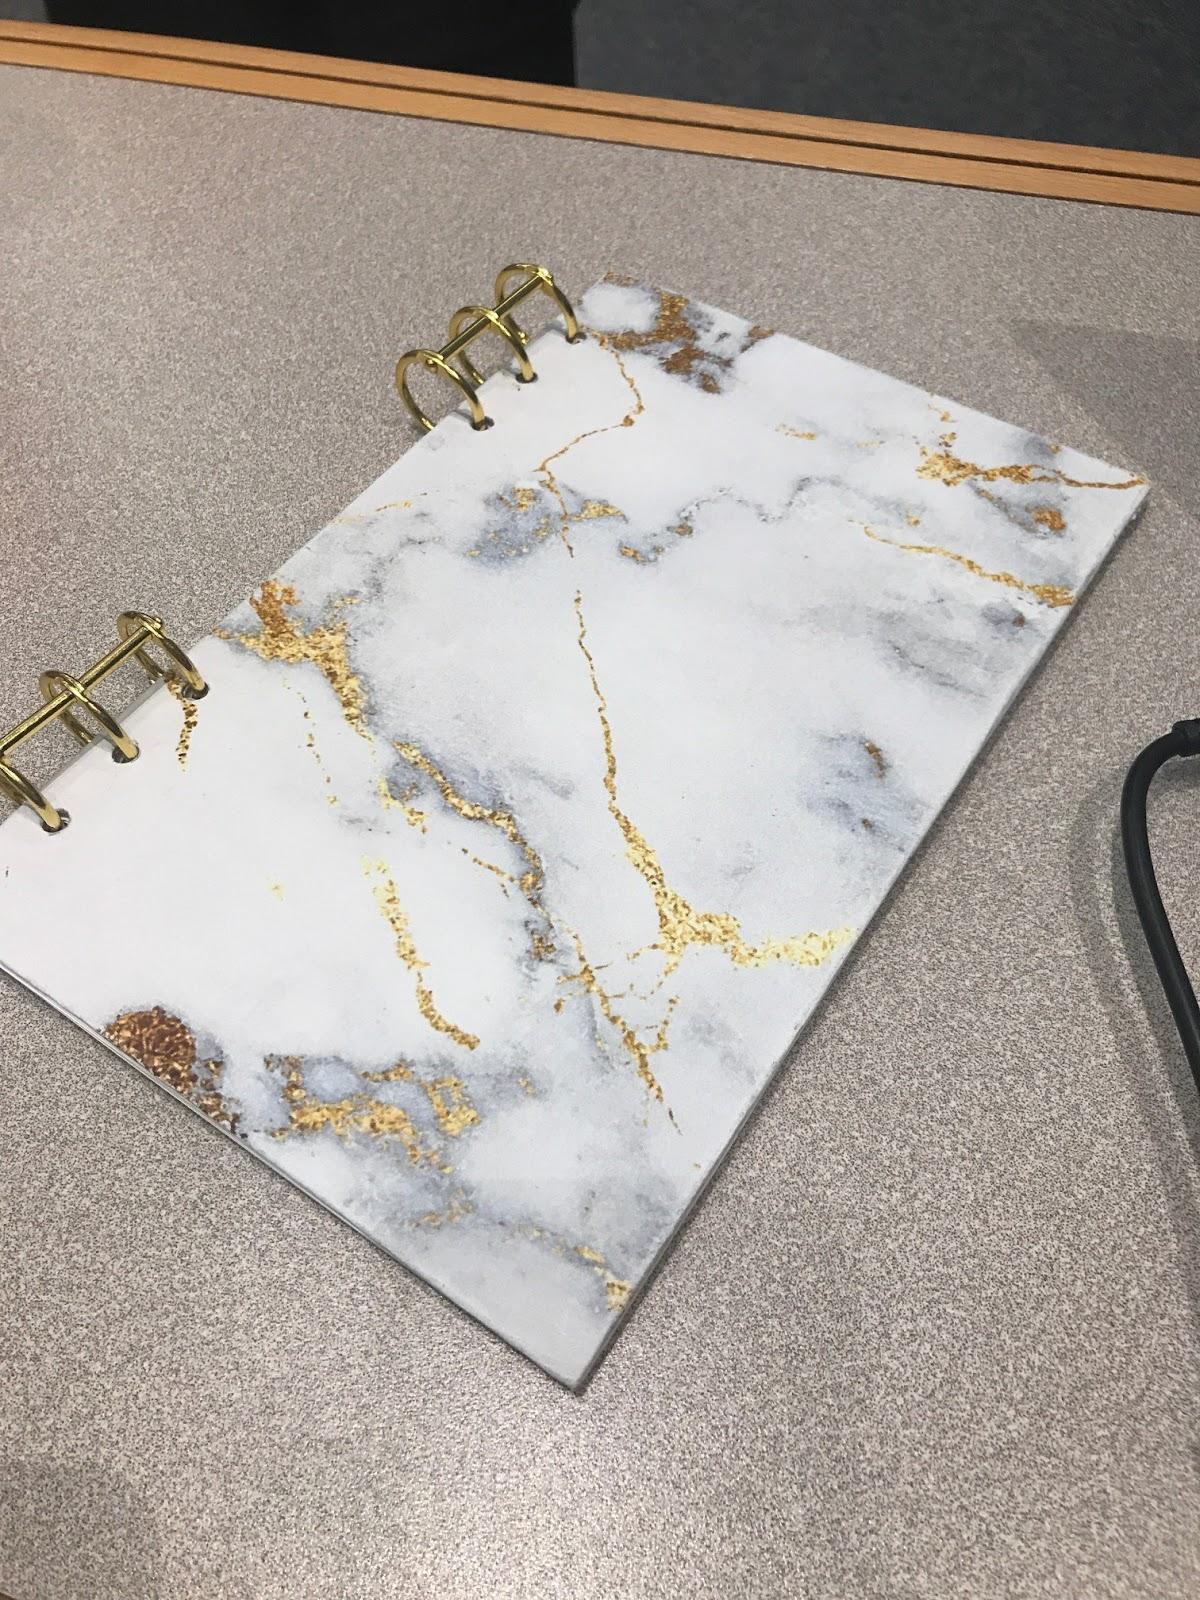 Notable Notebooks prototype